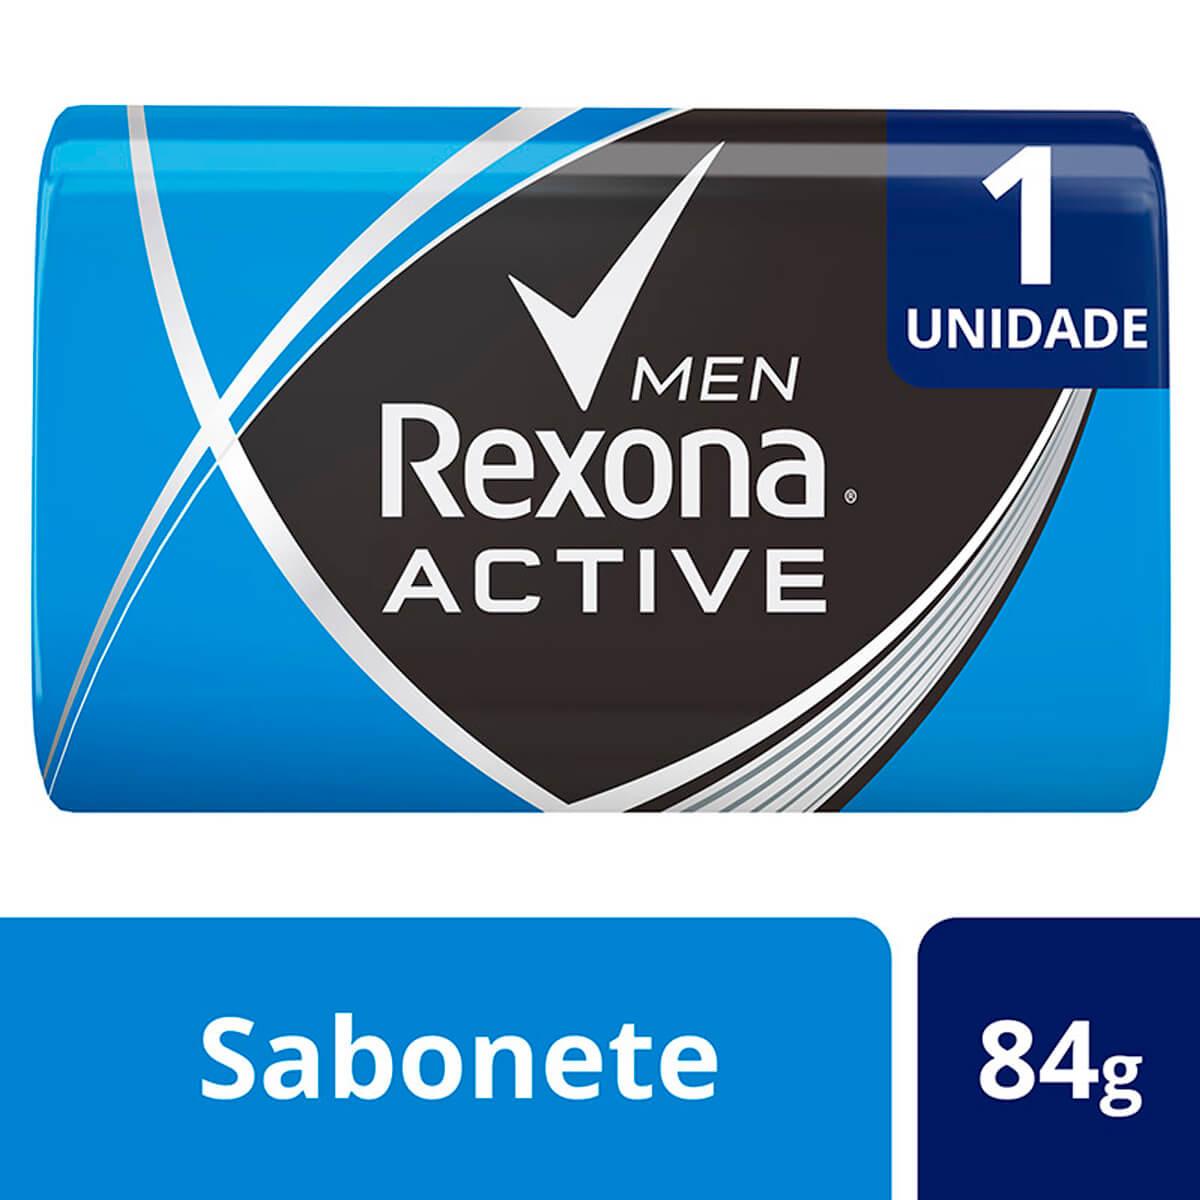 Sabonete em Barra Rexona Men Active Fresh Azul 84g 84g